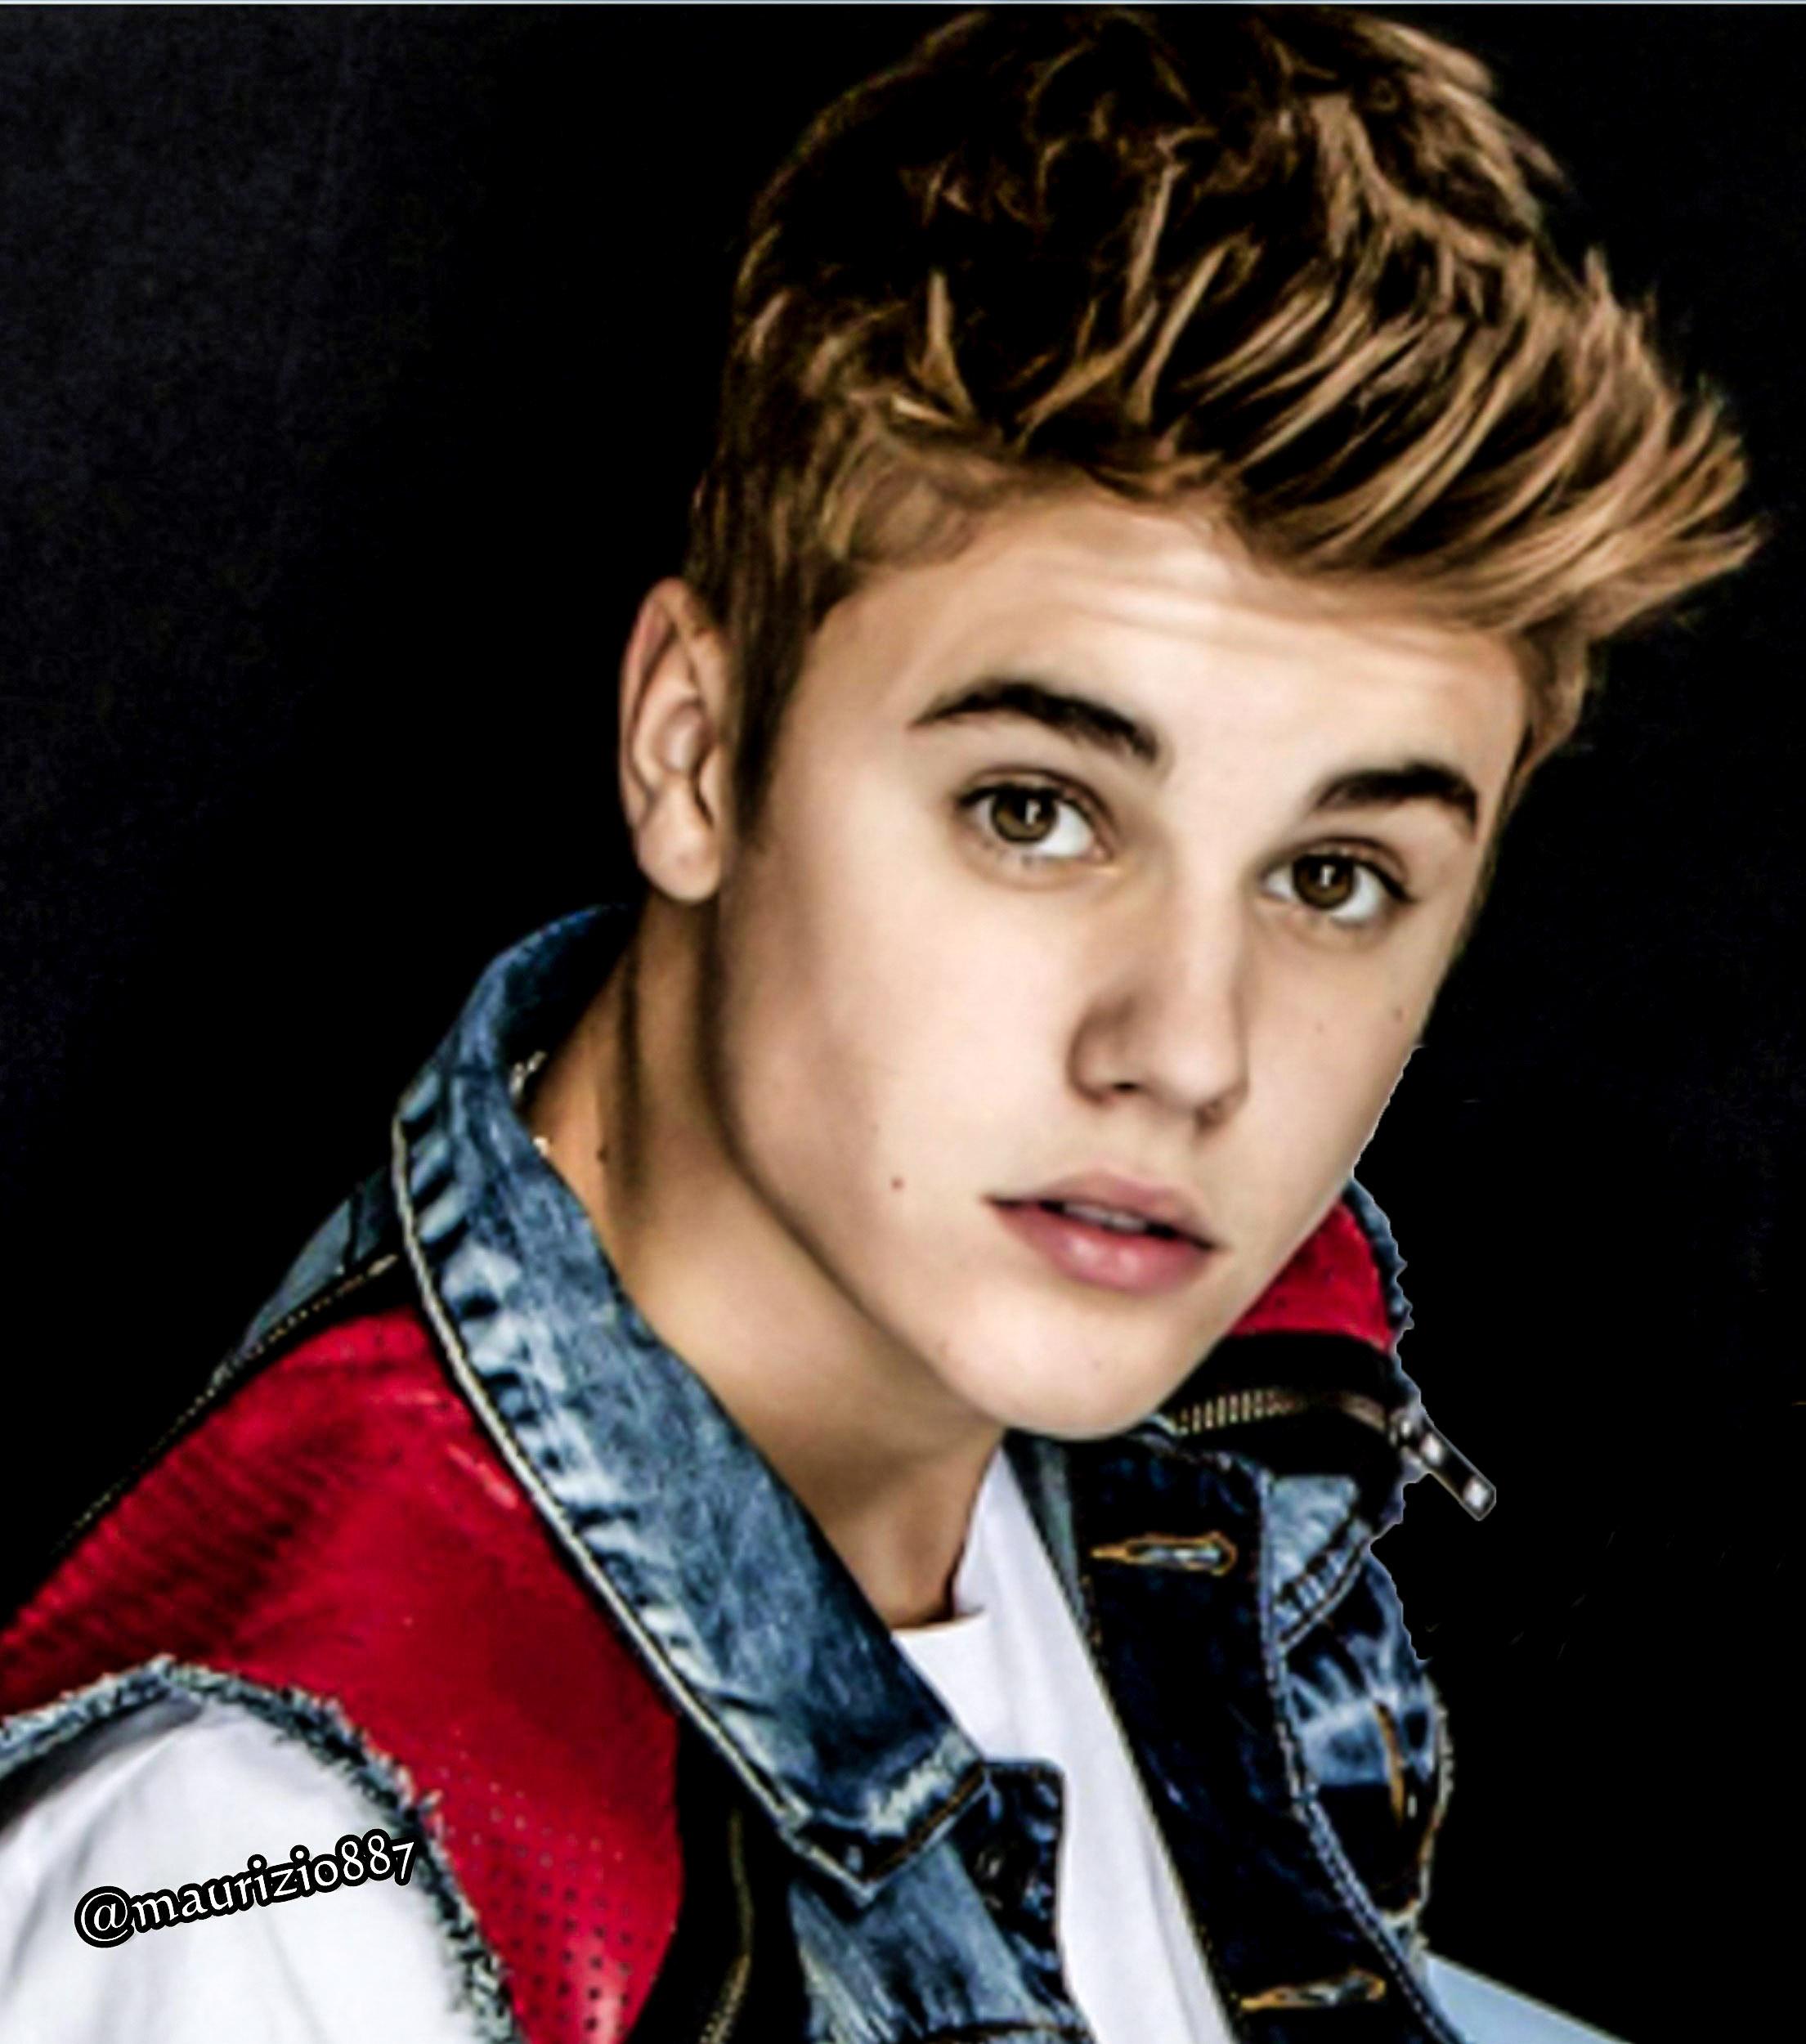 Justin Bieber New Wallpapers 2015 2209x2500